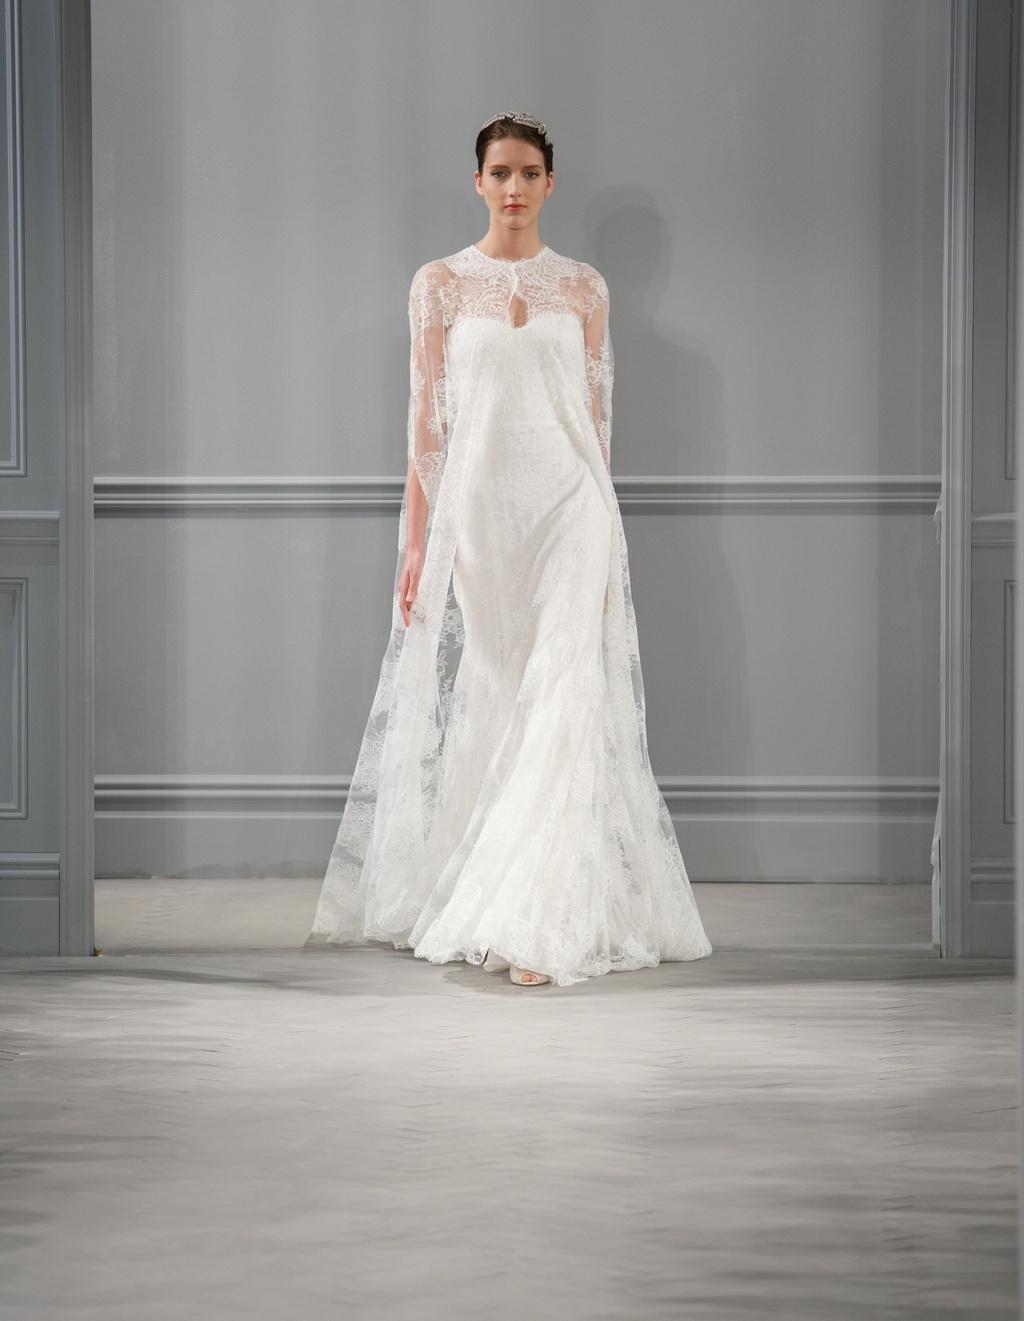 Spring-2014-lace-monique-lhuillier-wedding-dress.full